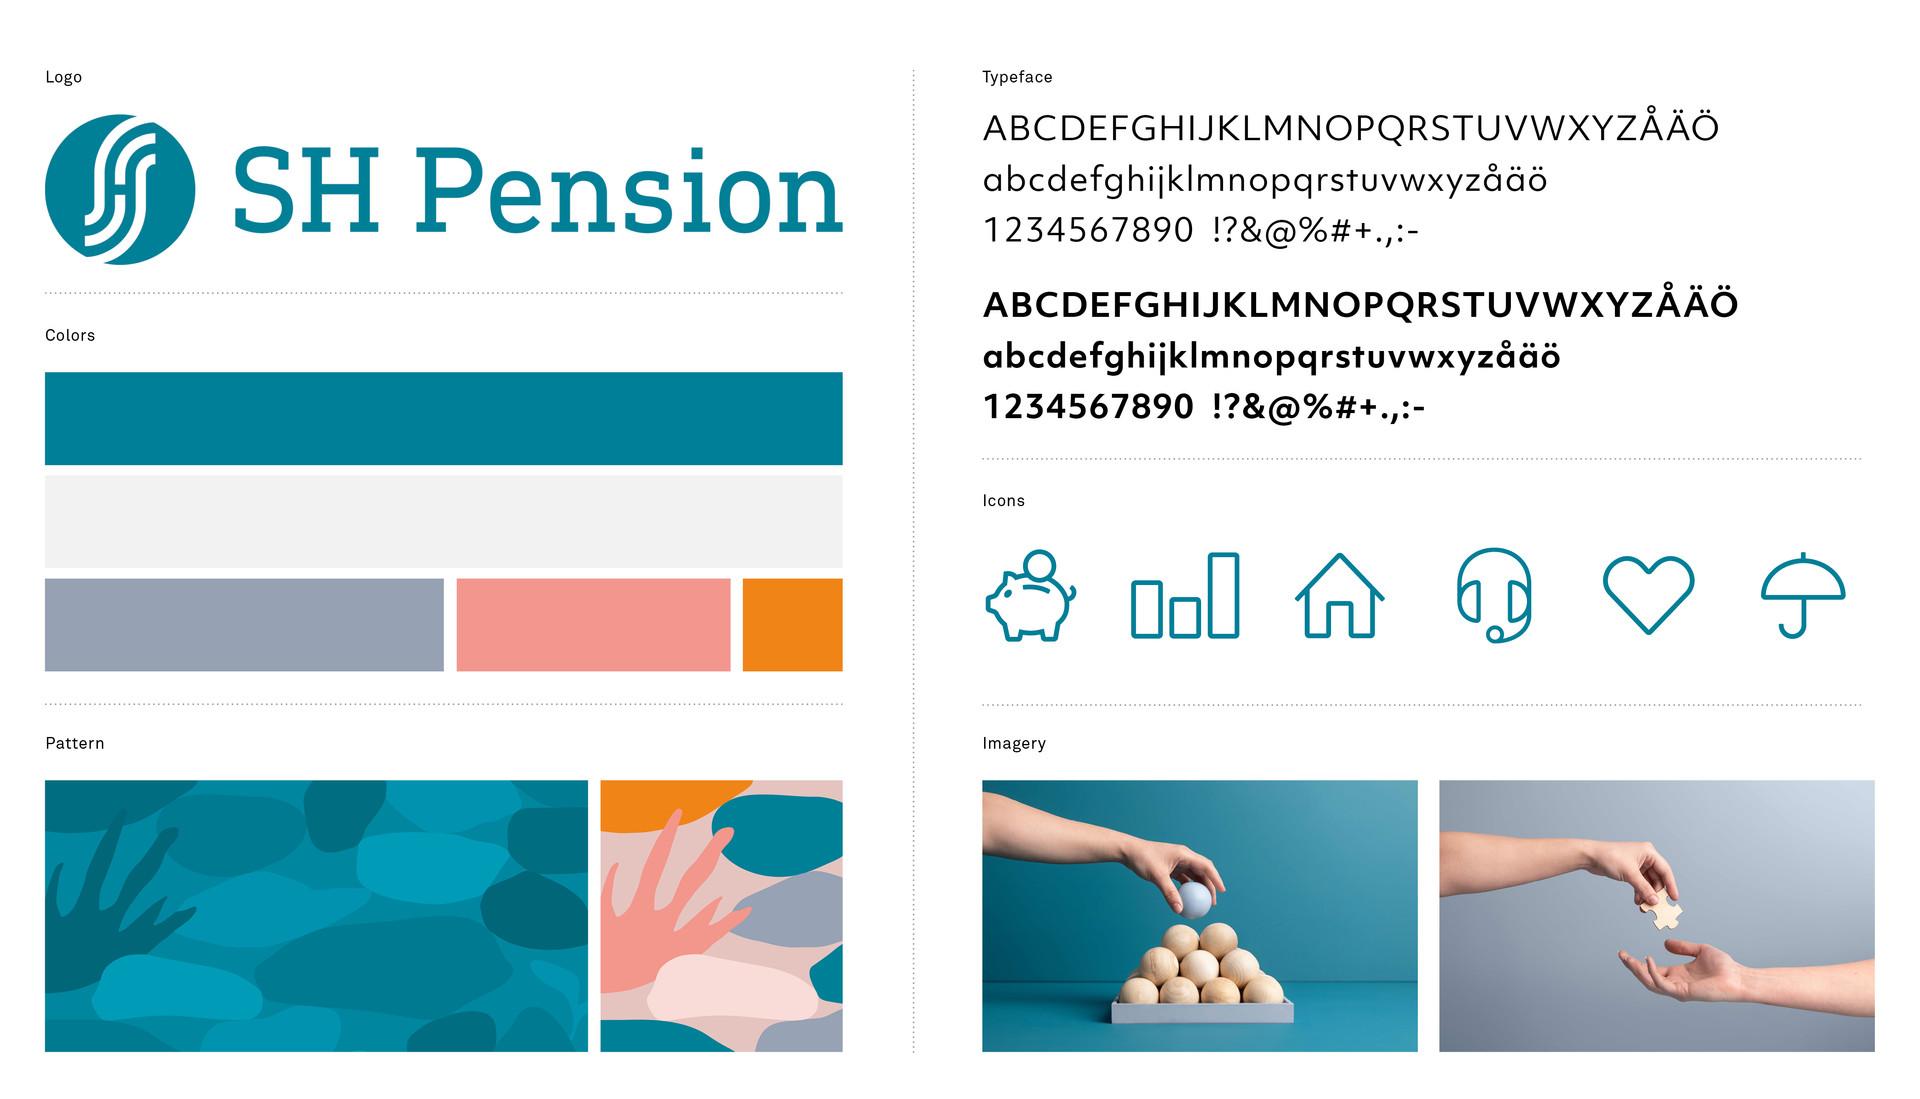 Svenska Designpriset_SH Pension_overview